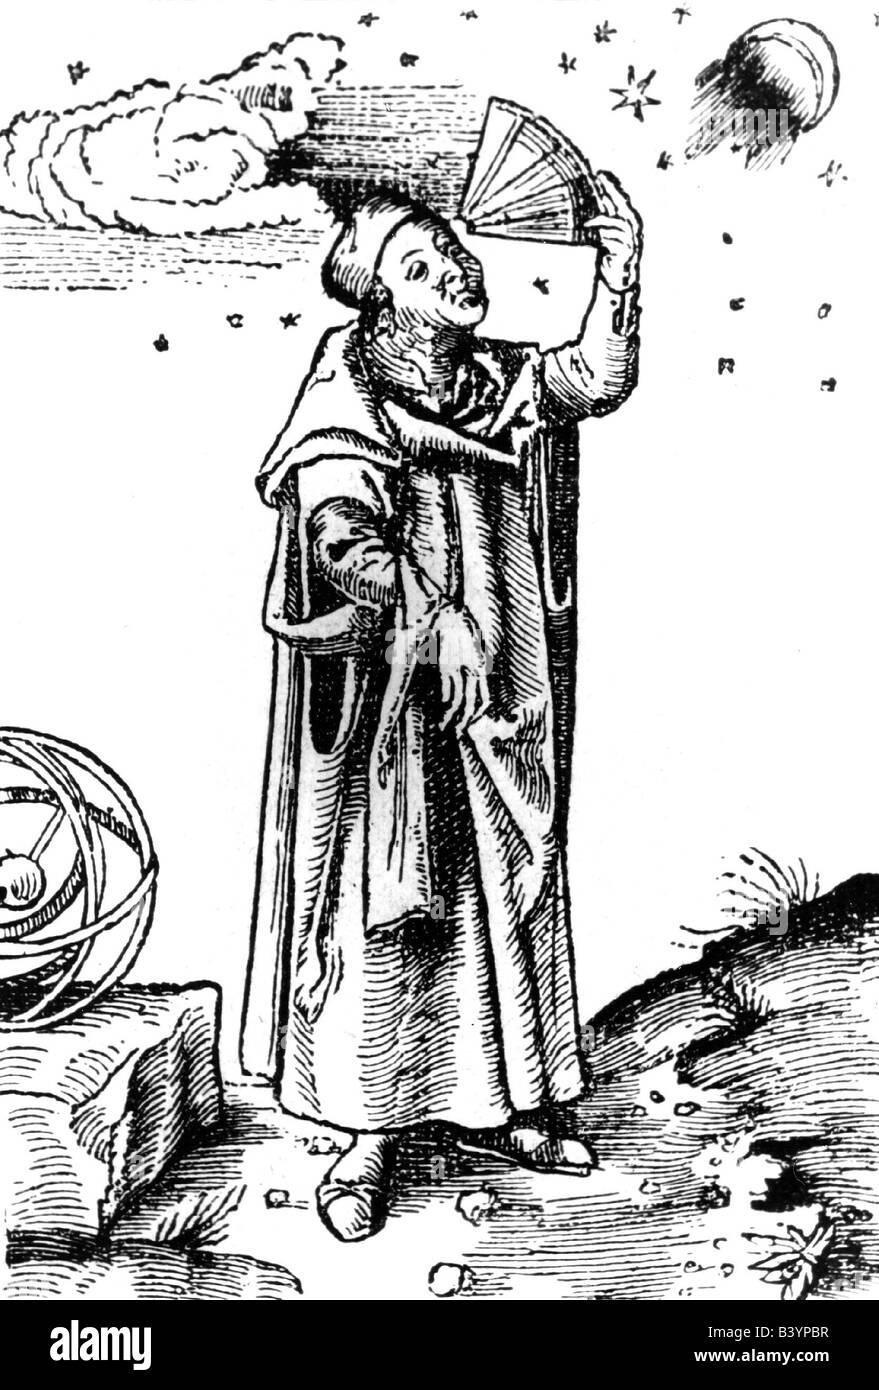 Brahe, Tycho, 14.12.1546 - 24.10.1601, Danish astronomer, woodcut,  nobleman, Tyge, astronomical instrument, Quadrans - Stock Image